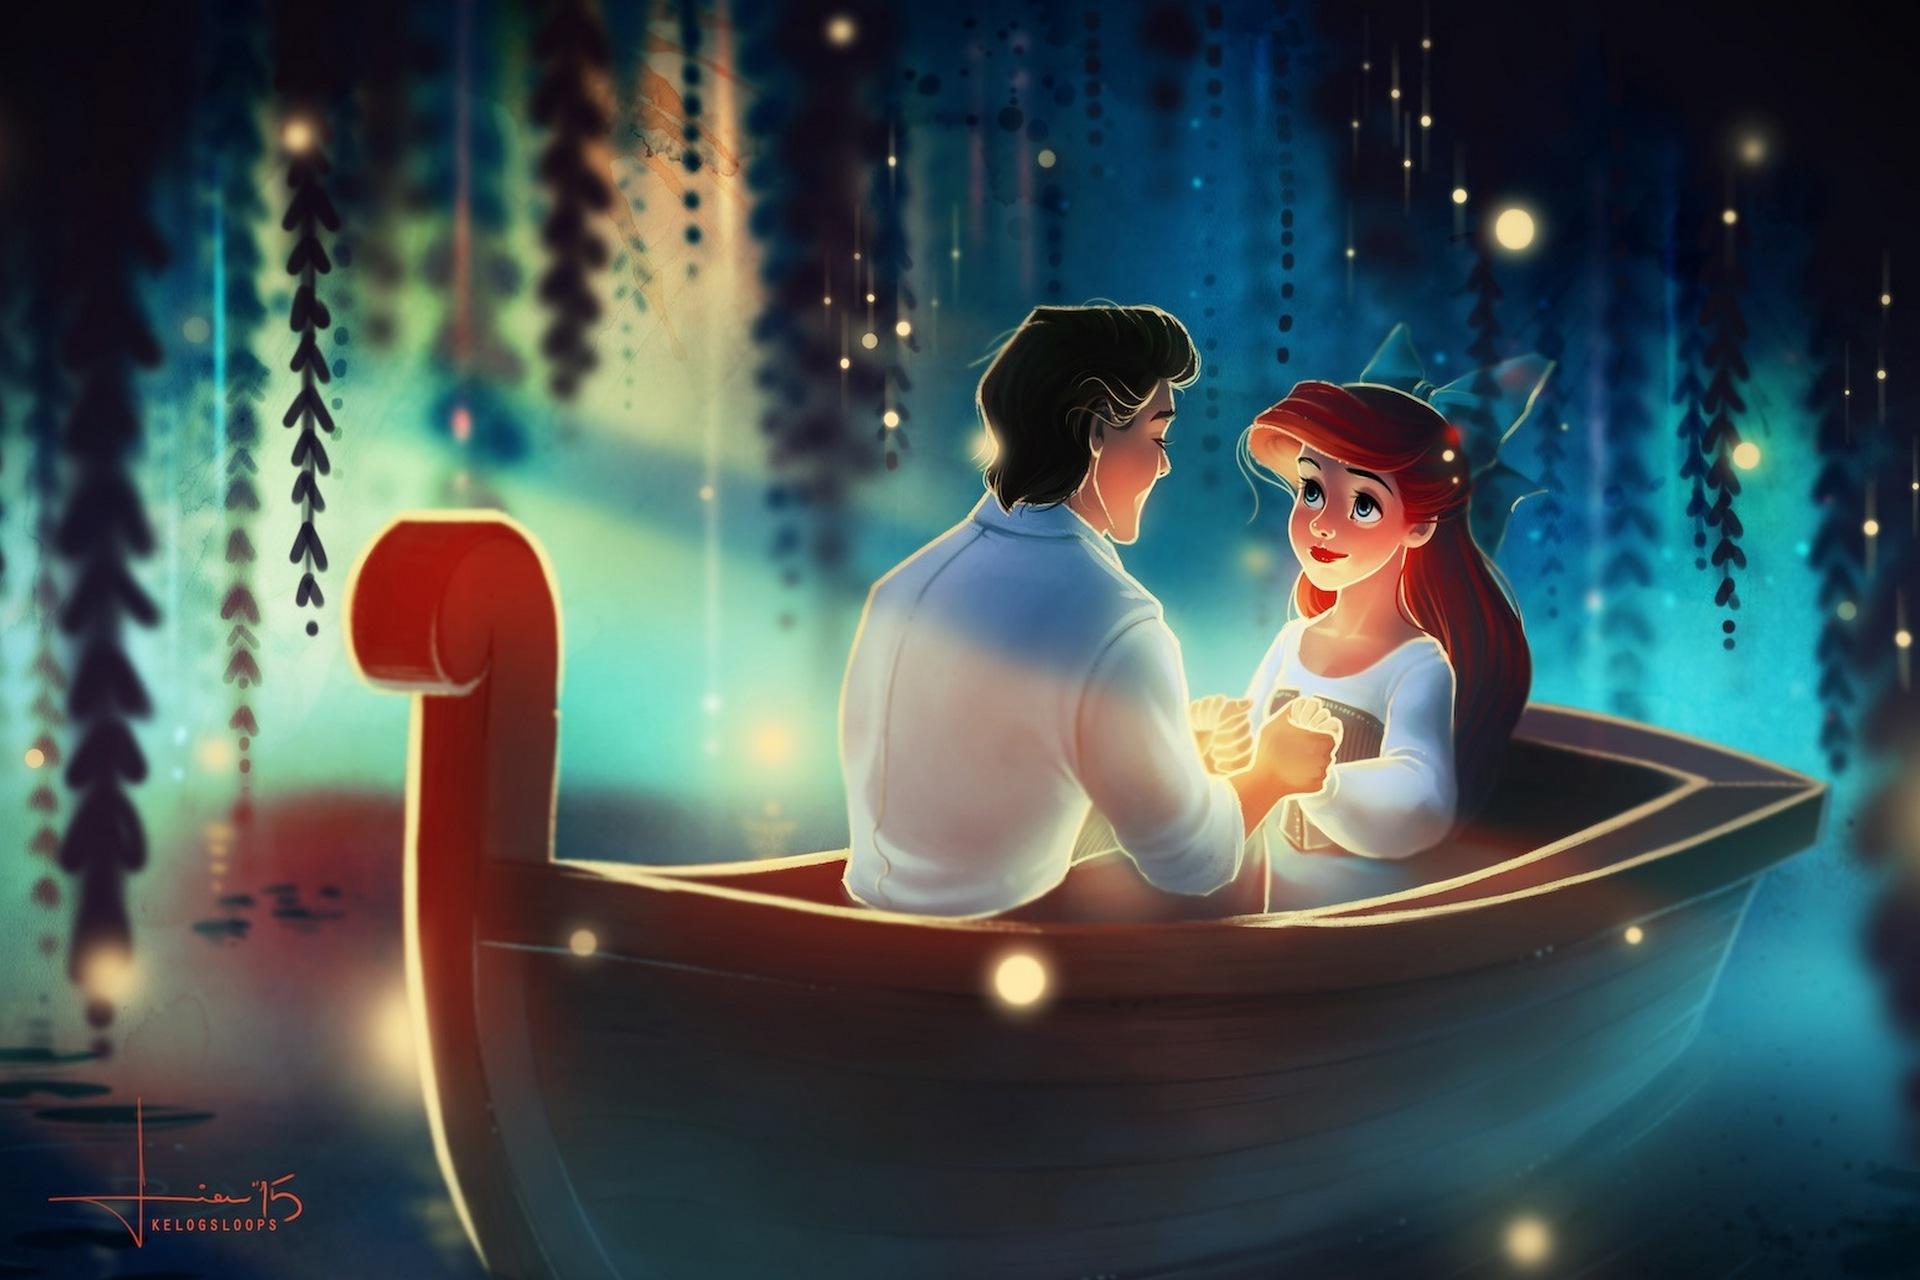 картинки с русалками и принц